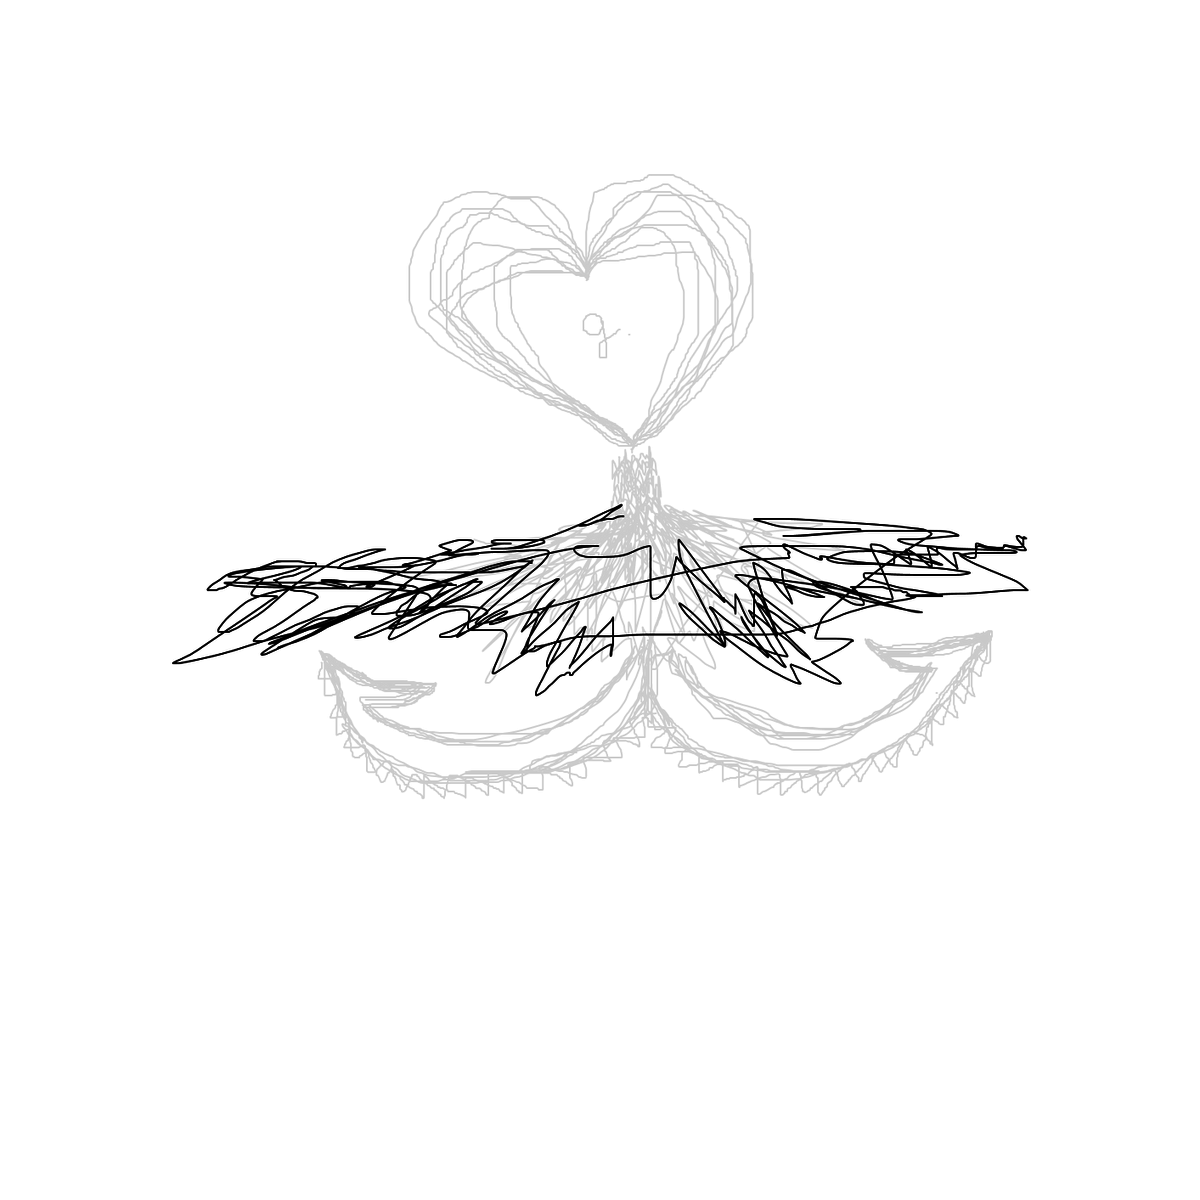 BAAAM drawing#8473 lat:46.0359954833984400lng: 18.6993618011474600